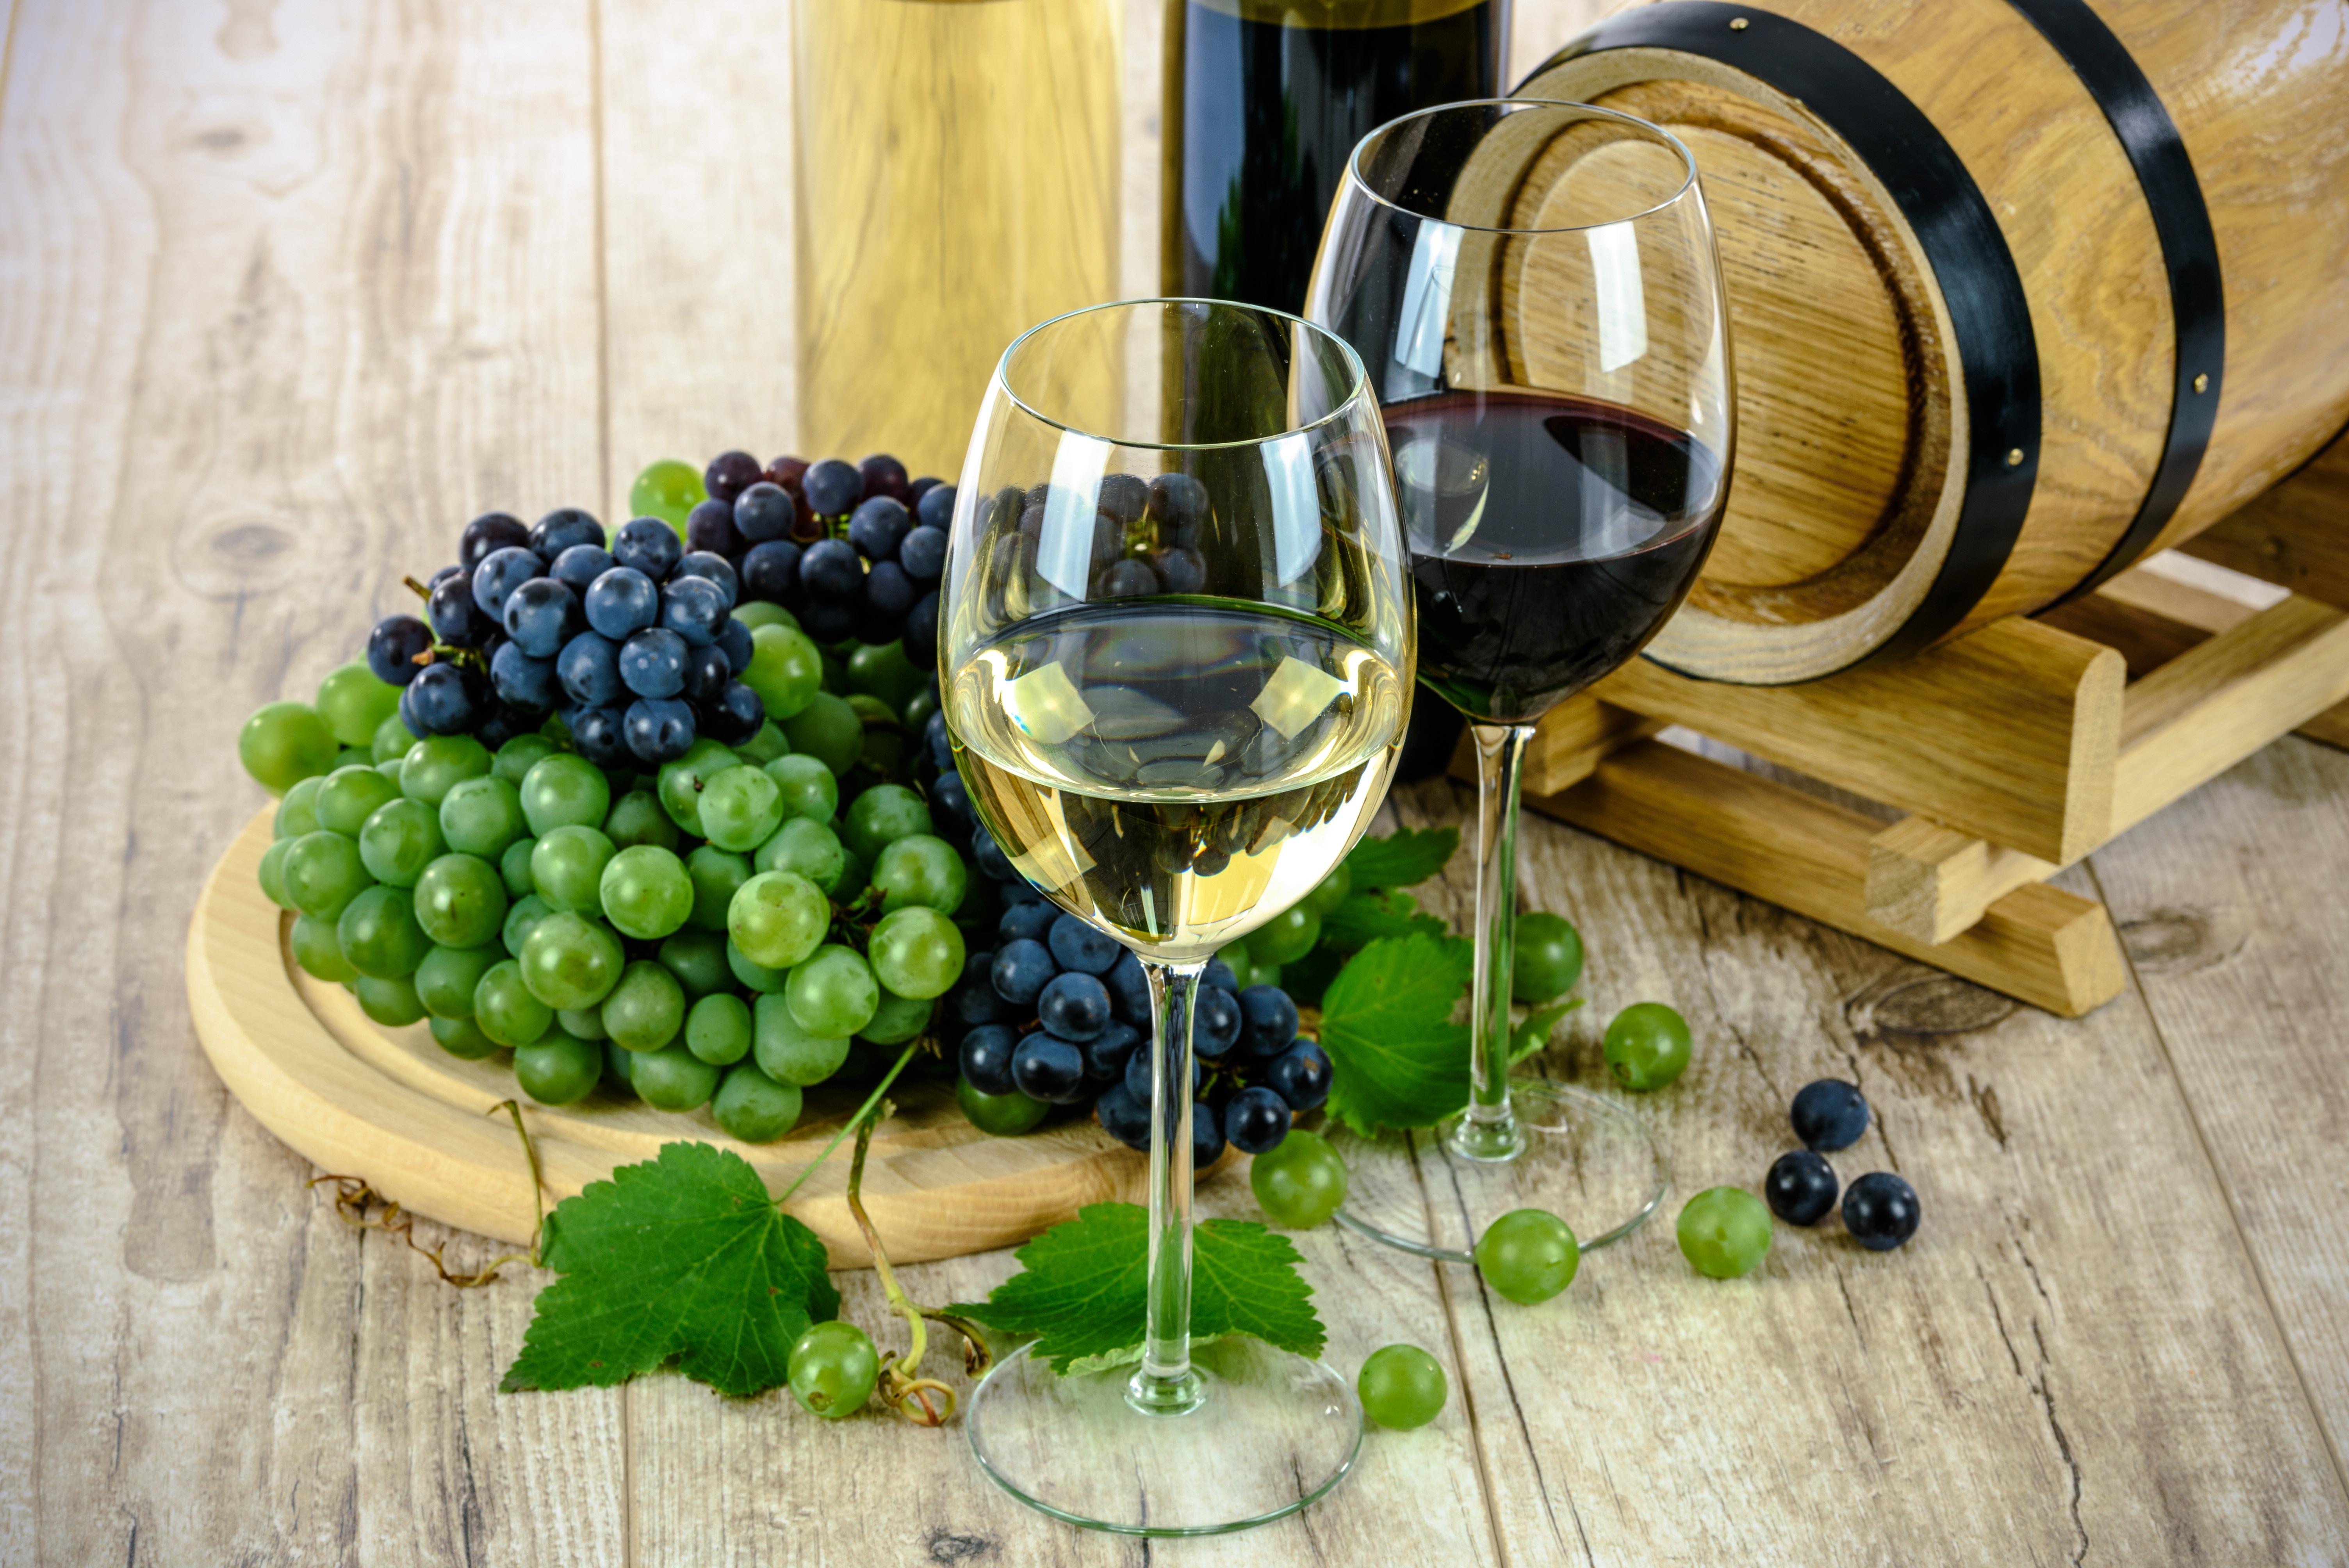 Single aktivitten vitis - Single lokale in niedernsill - rockmartonline.com 2020